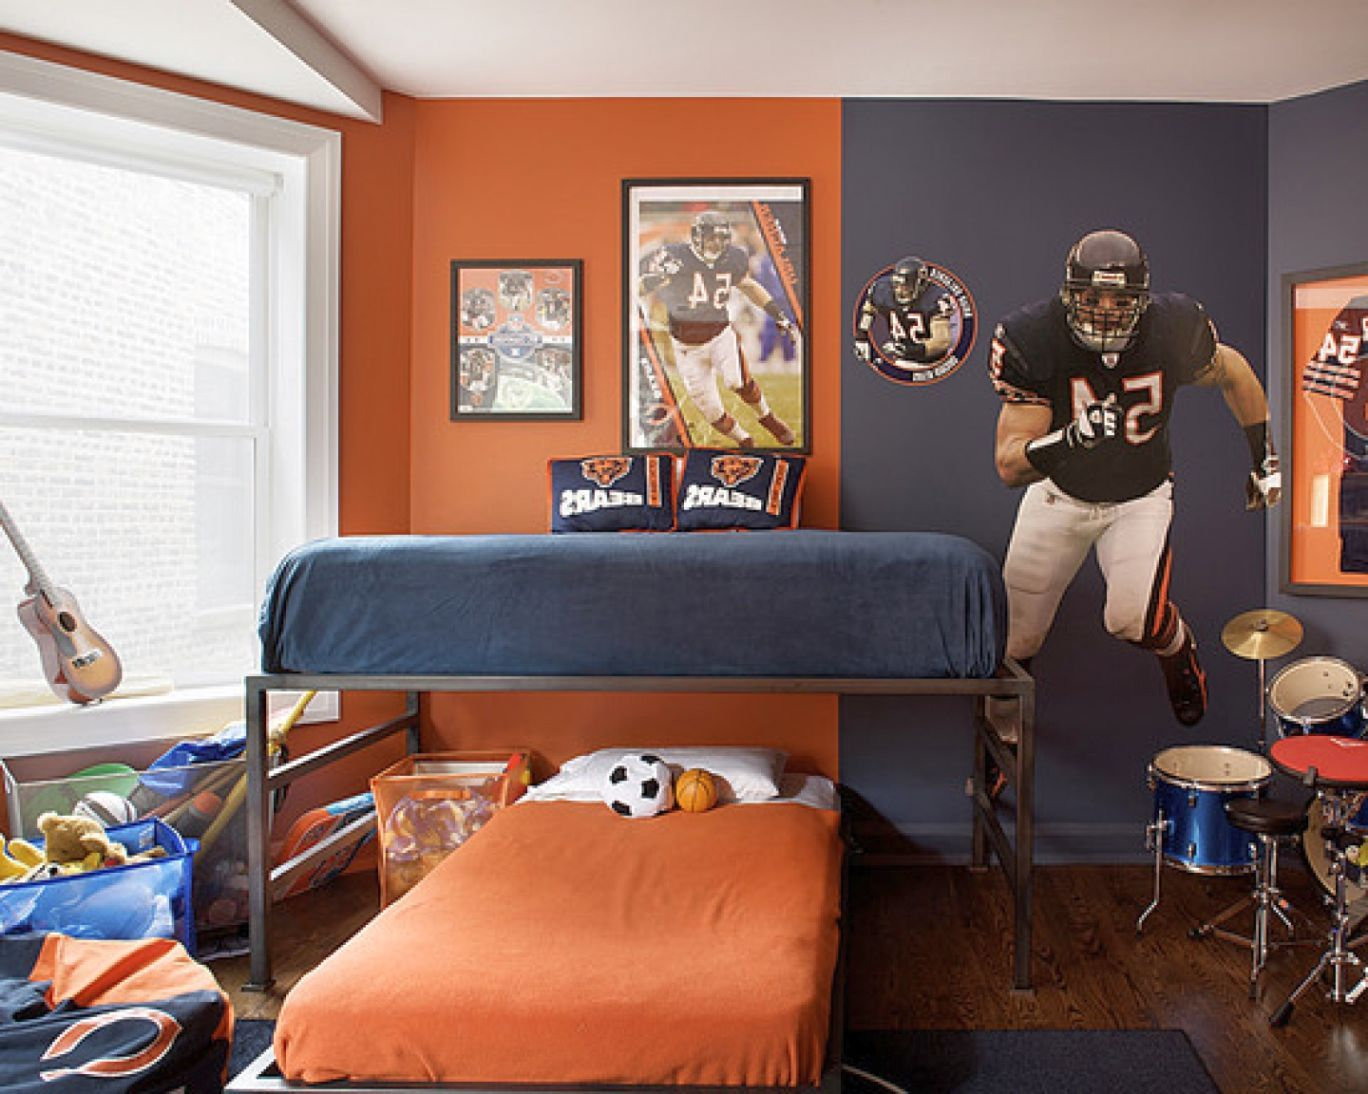 Sporty American Fottbal Themed Room Decor Ideas For